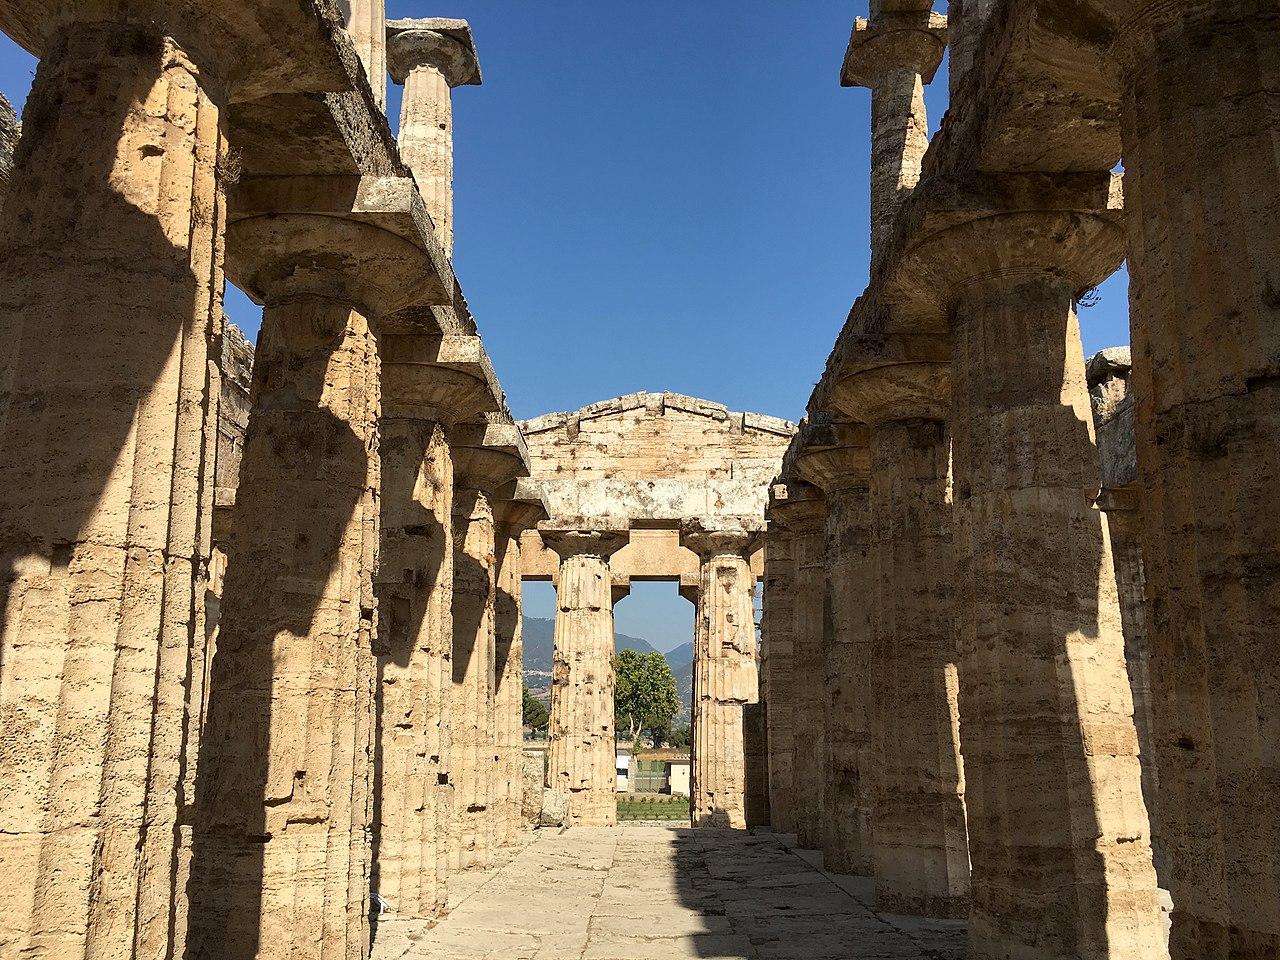 Interior Poseidón Paestum 33.jpg